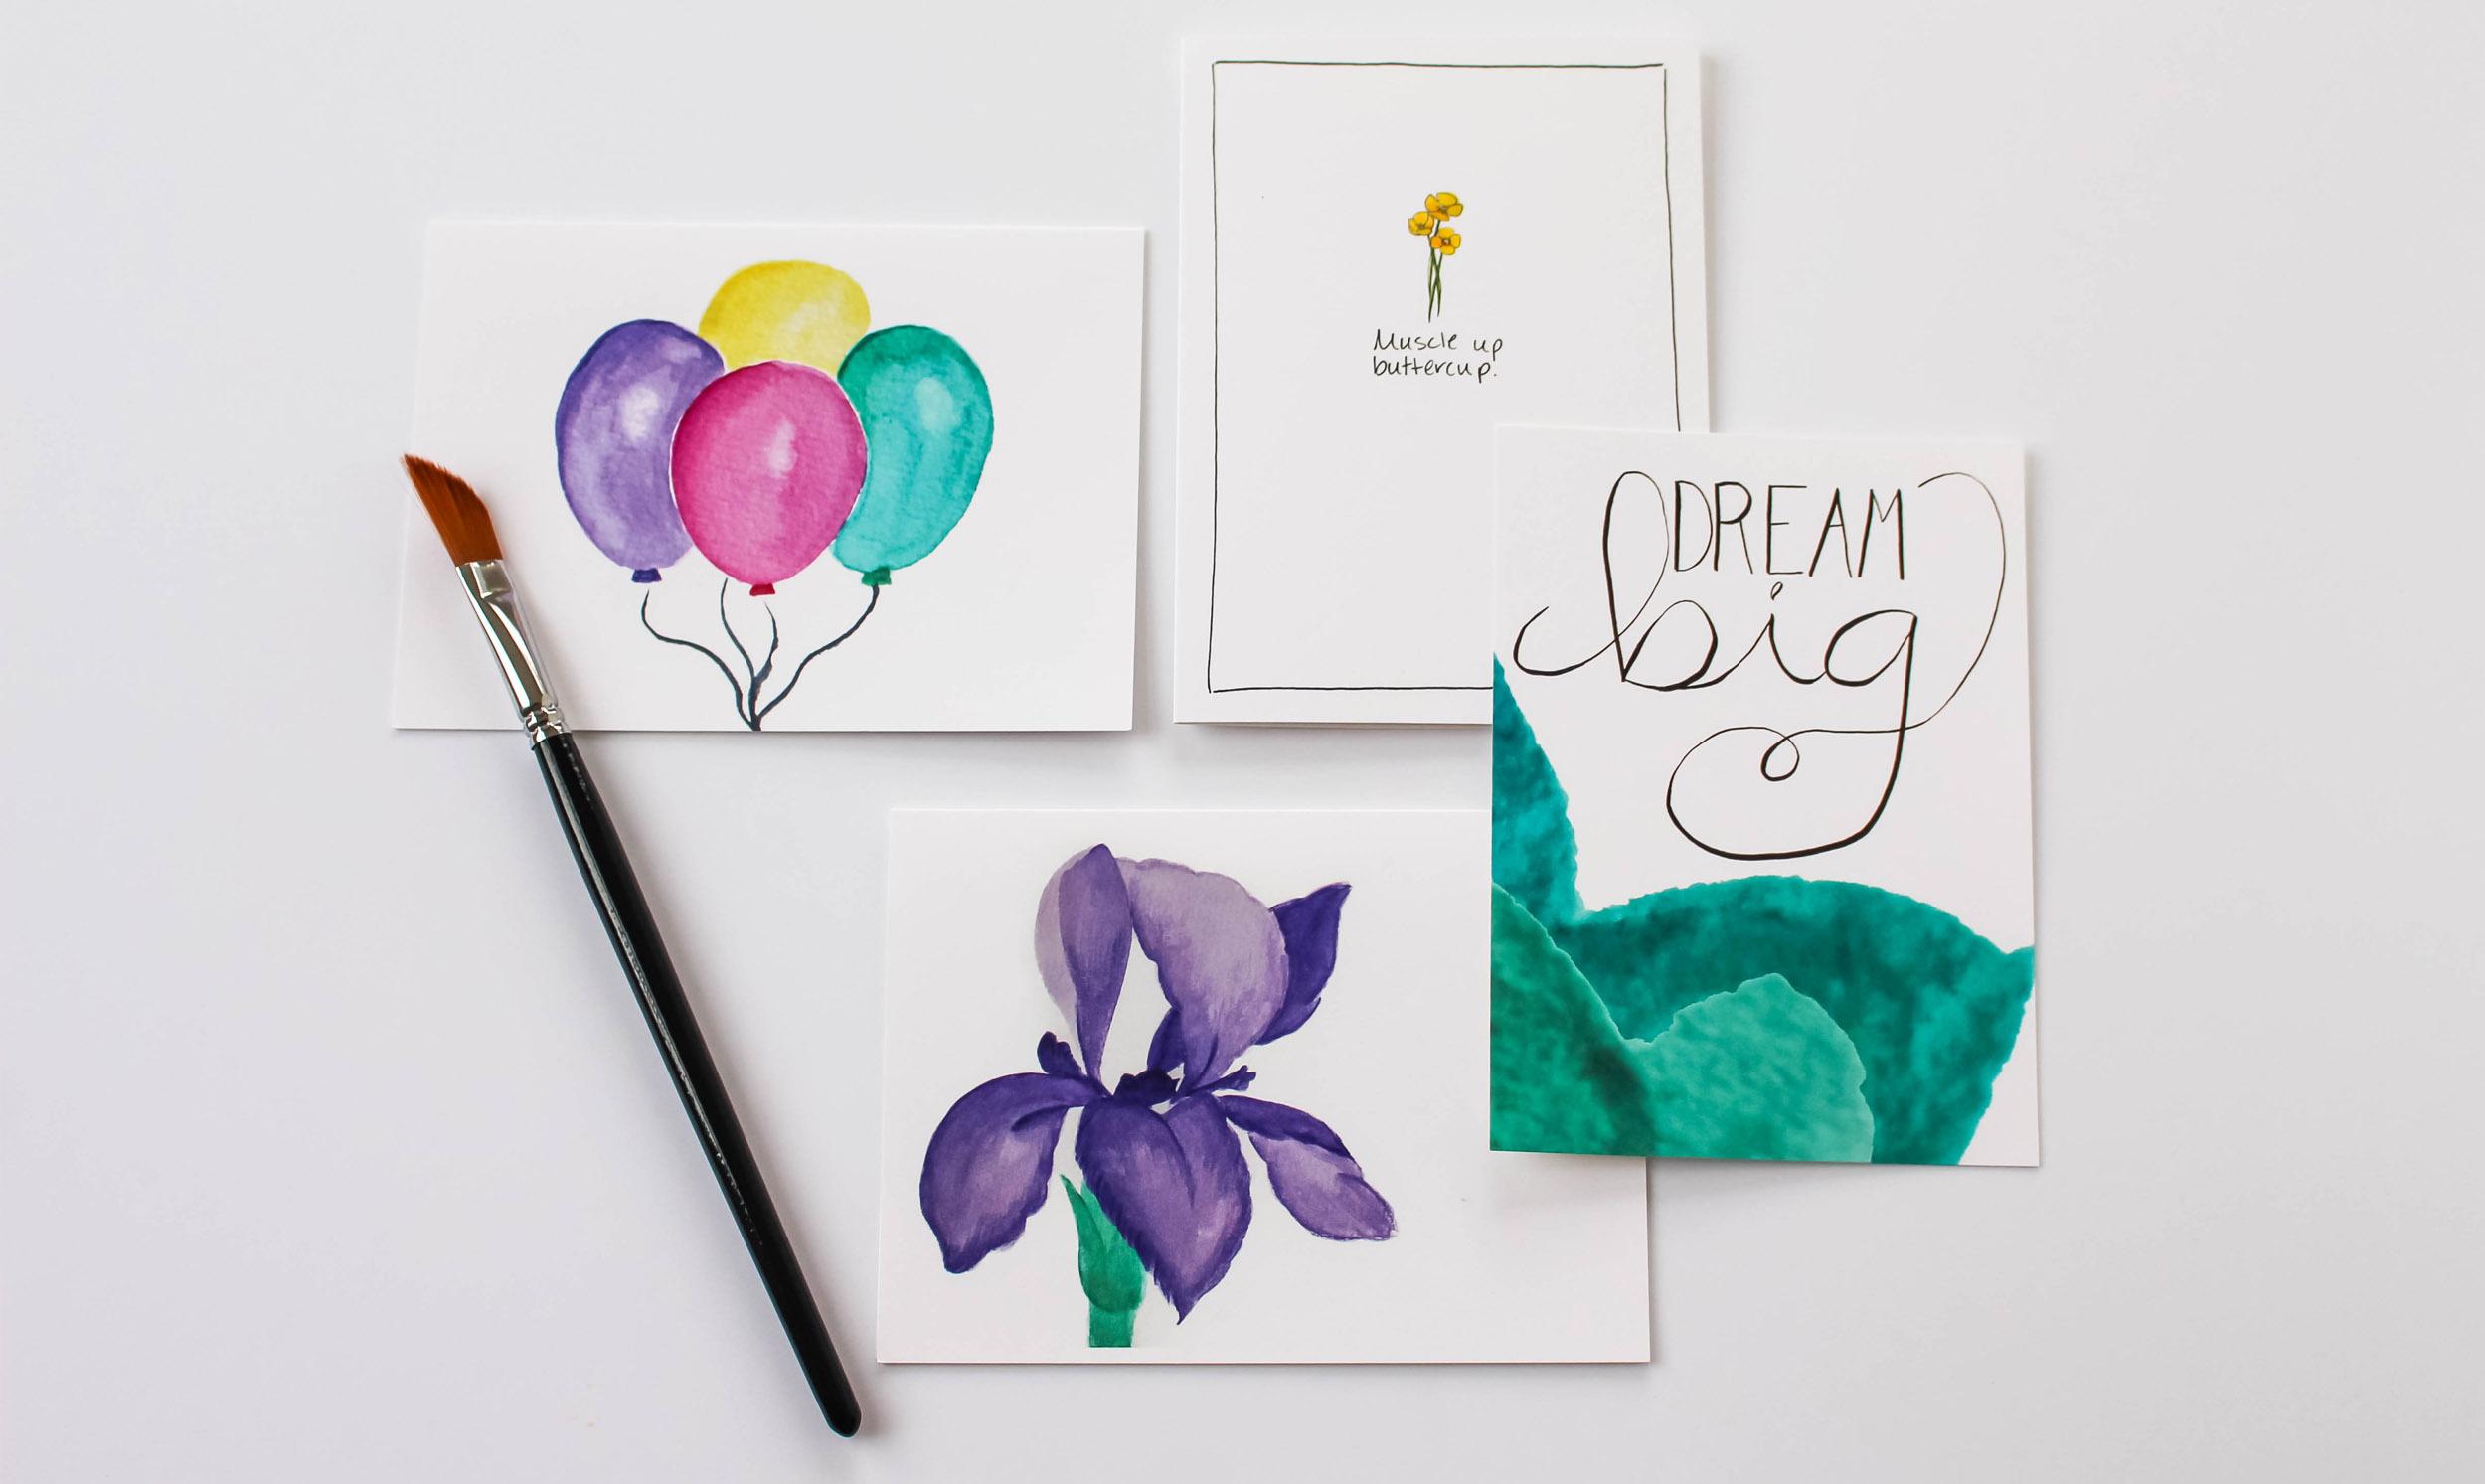 Cafe Notes + Company Balloon Dream Big + Paint Brush.jpg